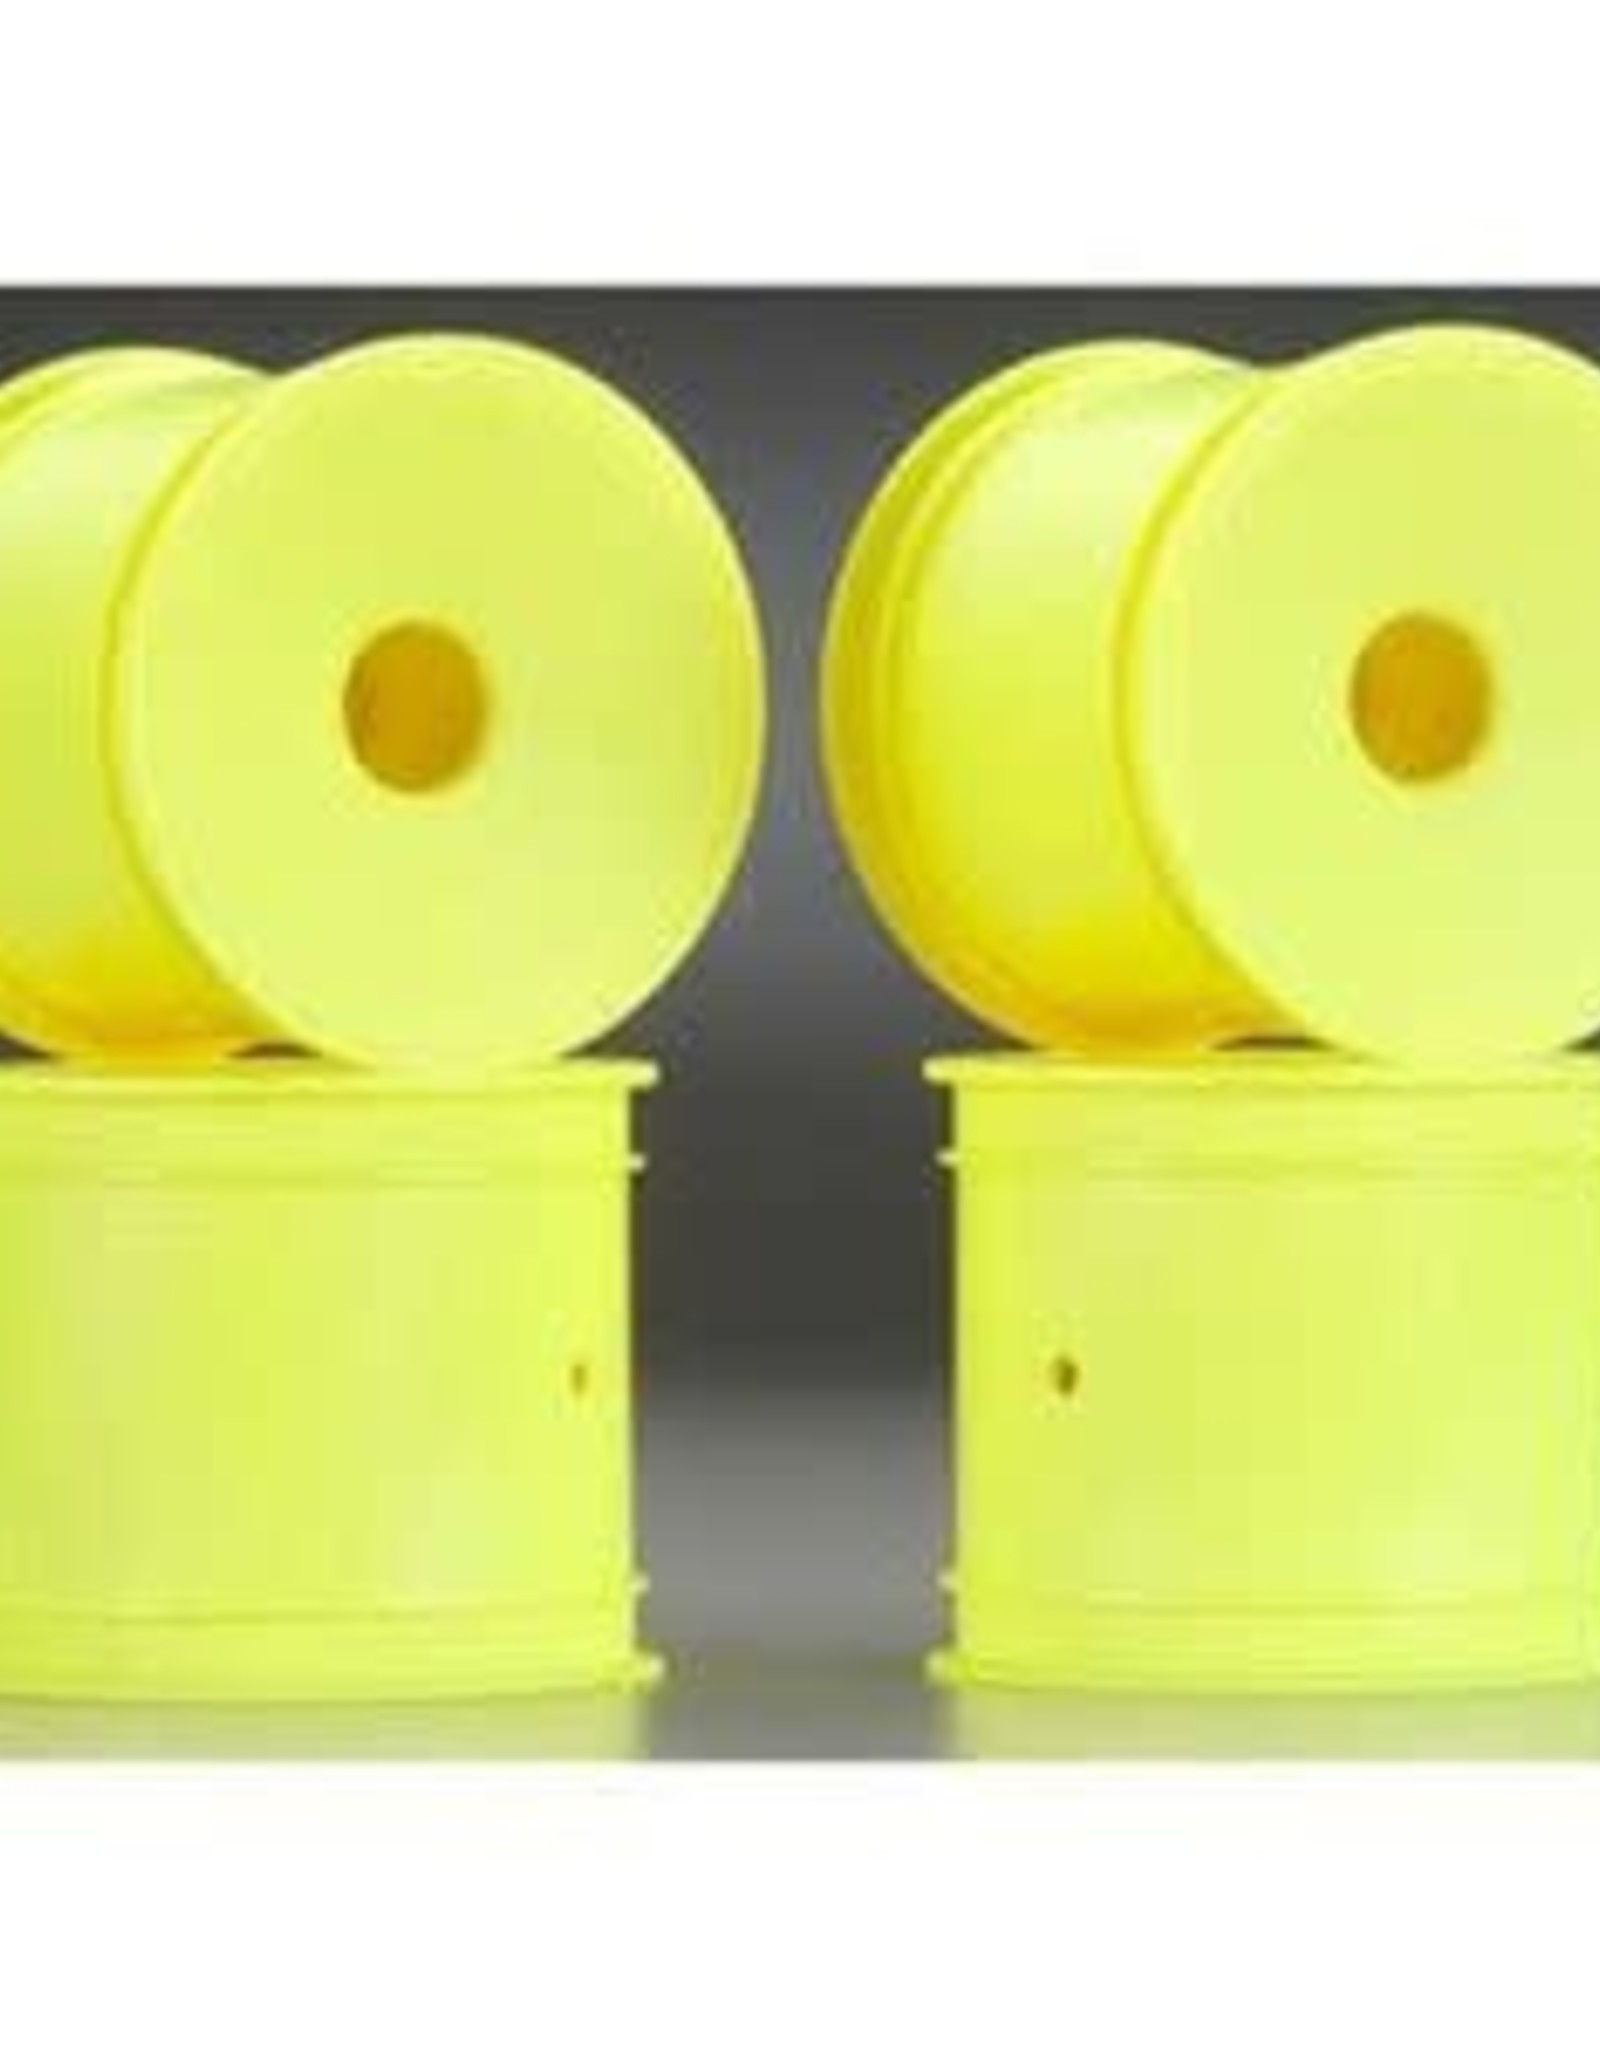 JConcepts Mono - T4.1 - 12mm Hex Front & Rear Wheel - Yellow - 4pc.